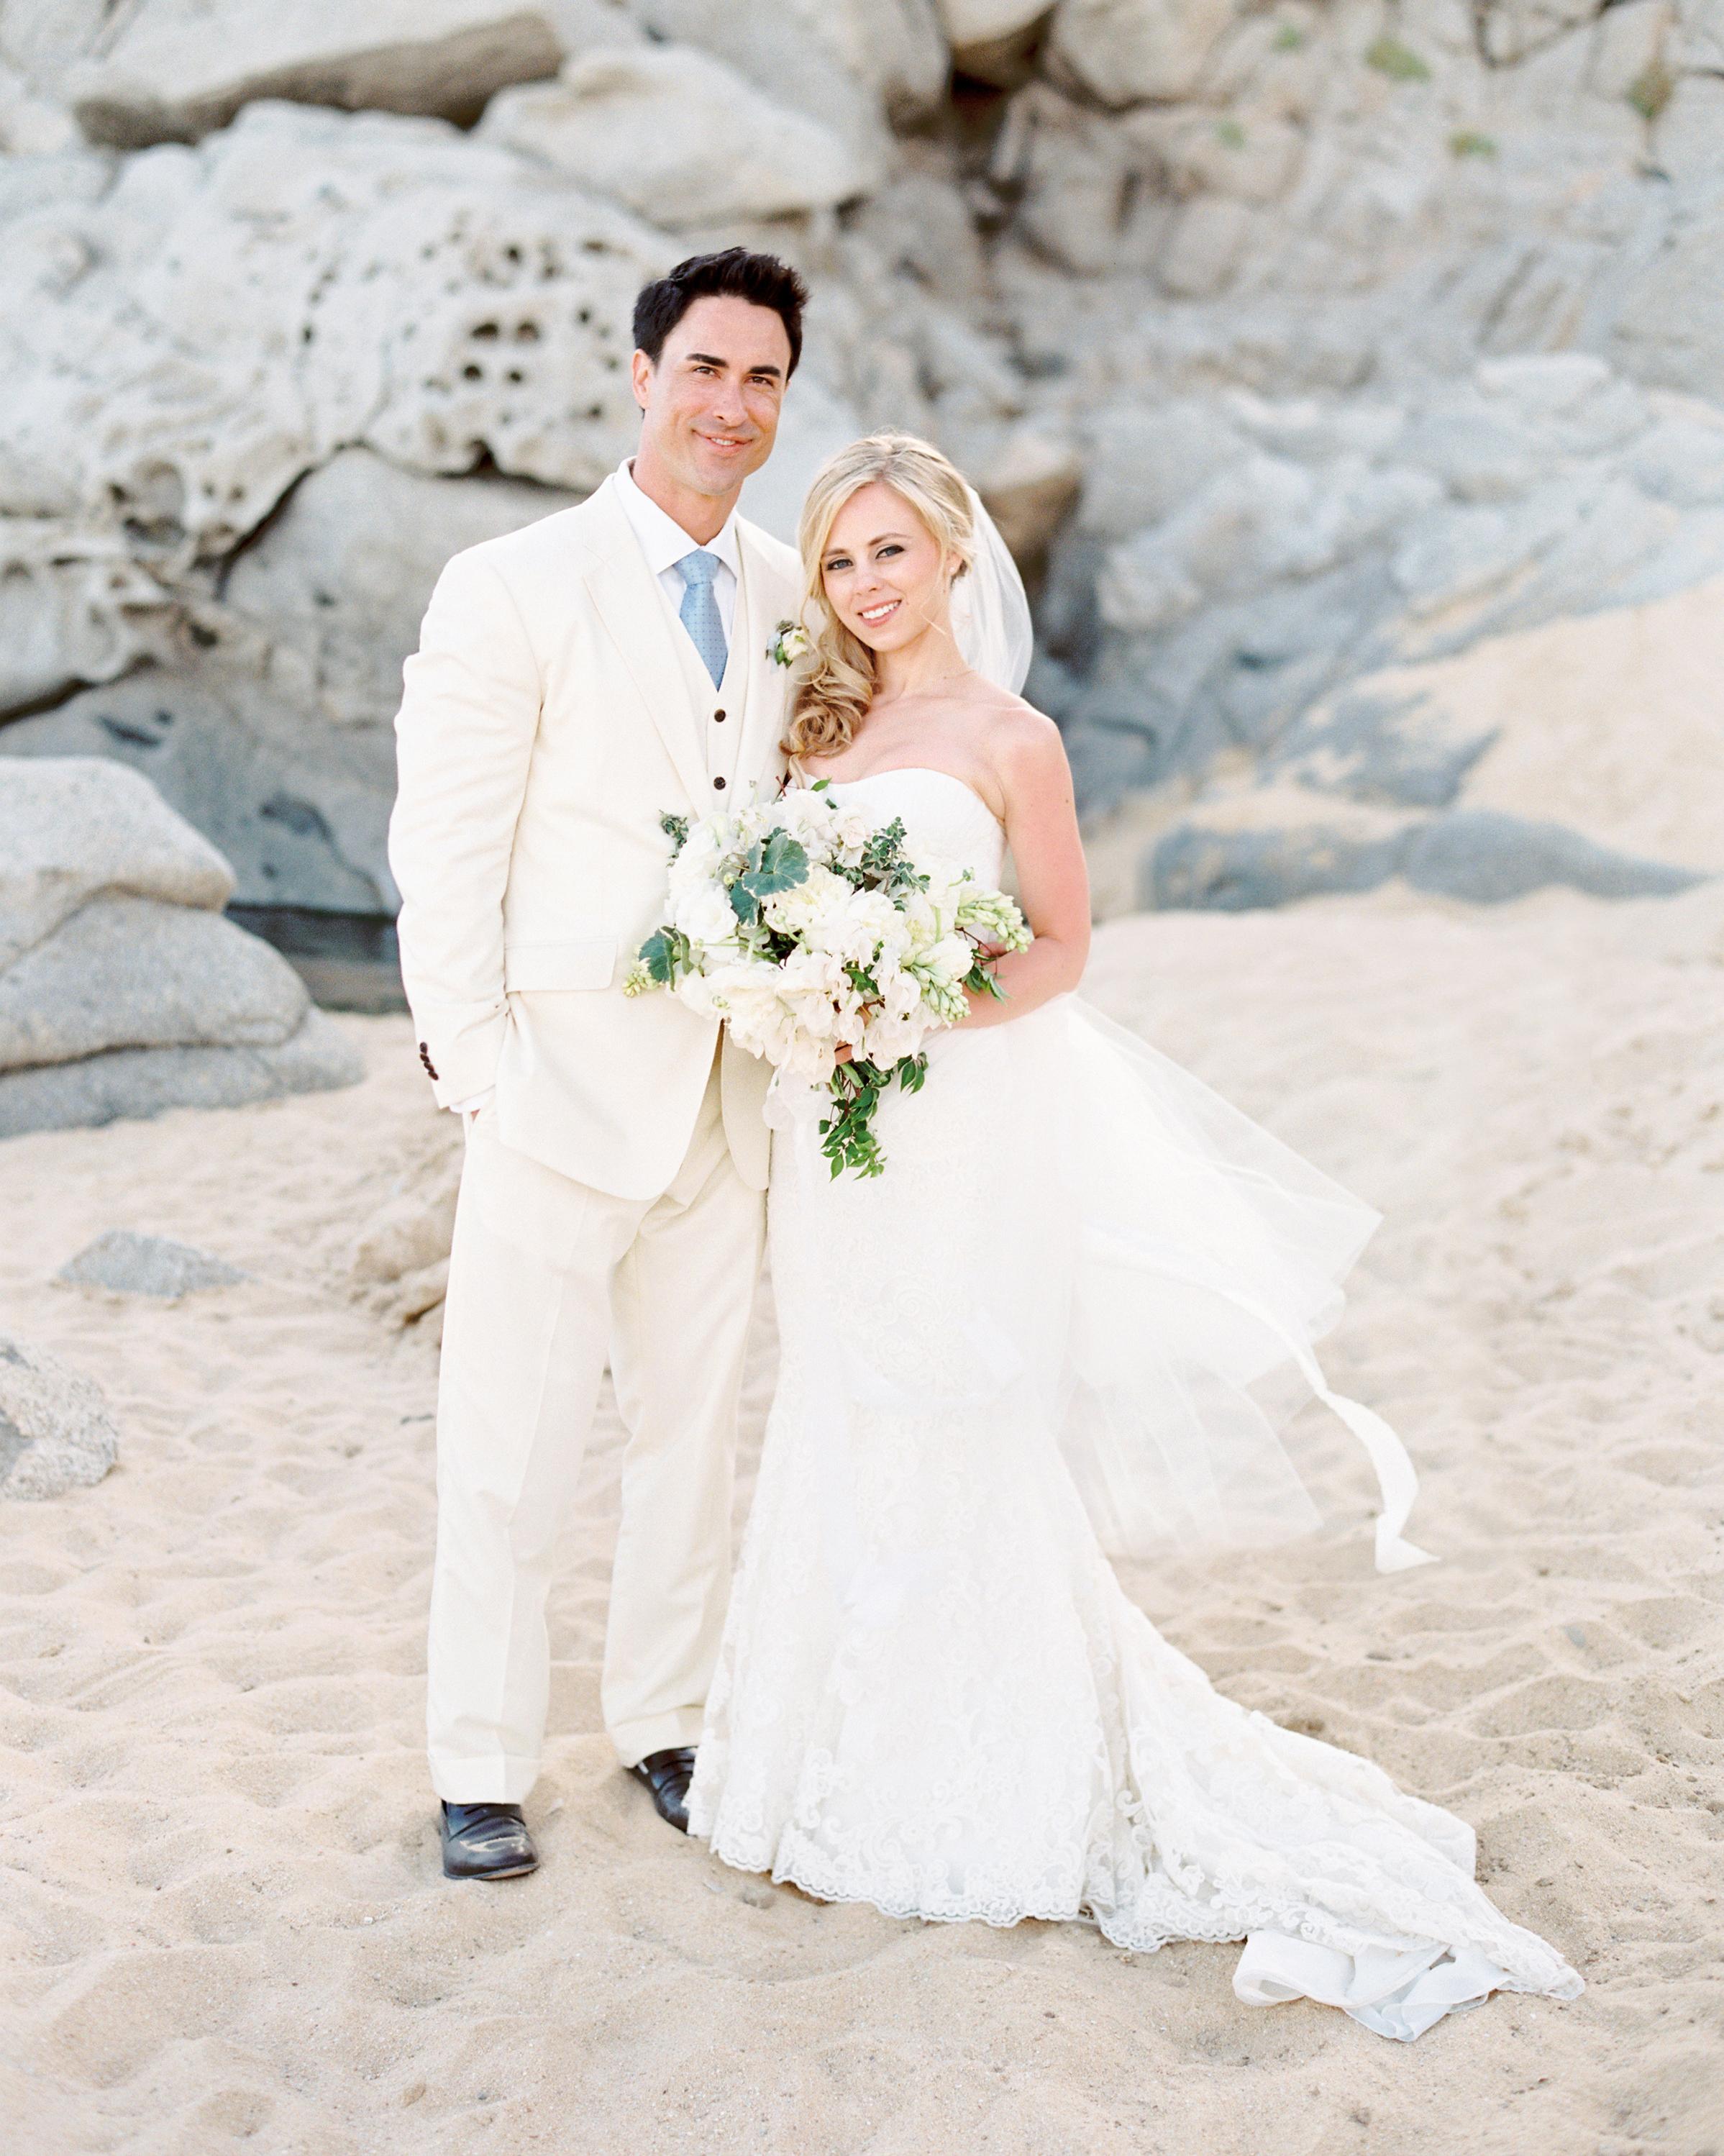 megan-jeremy-wedding-couple-54-s112680-0216.jpg